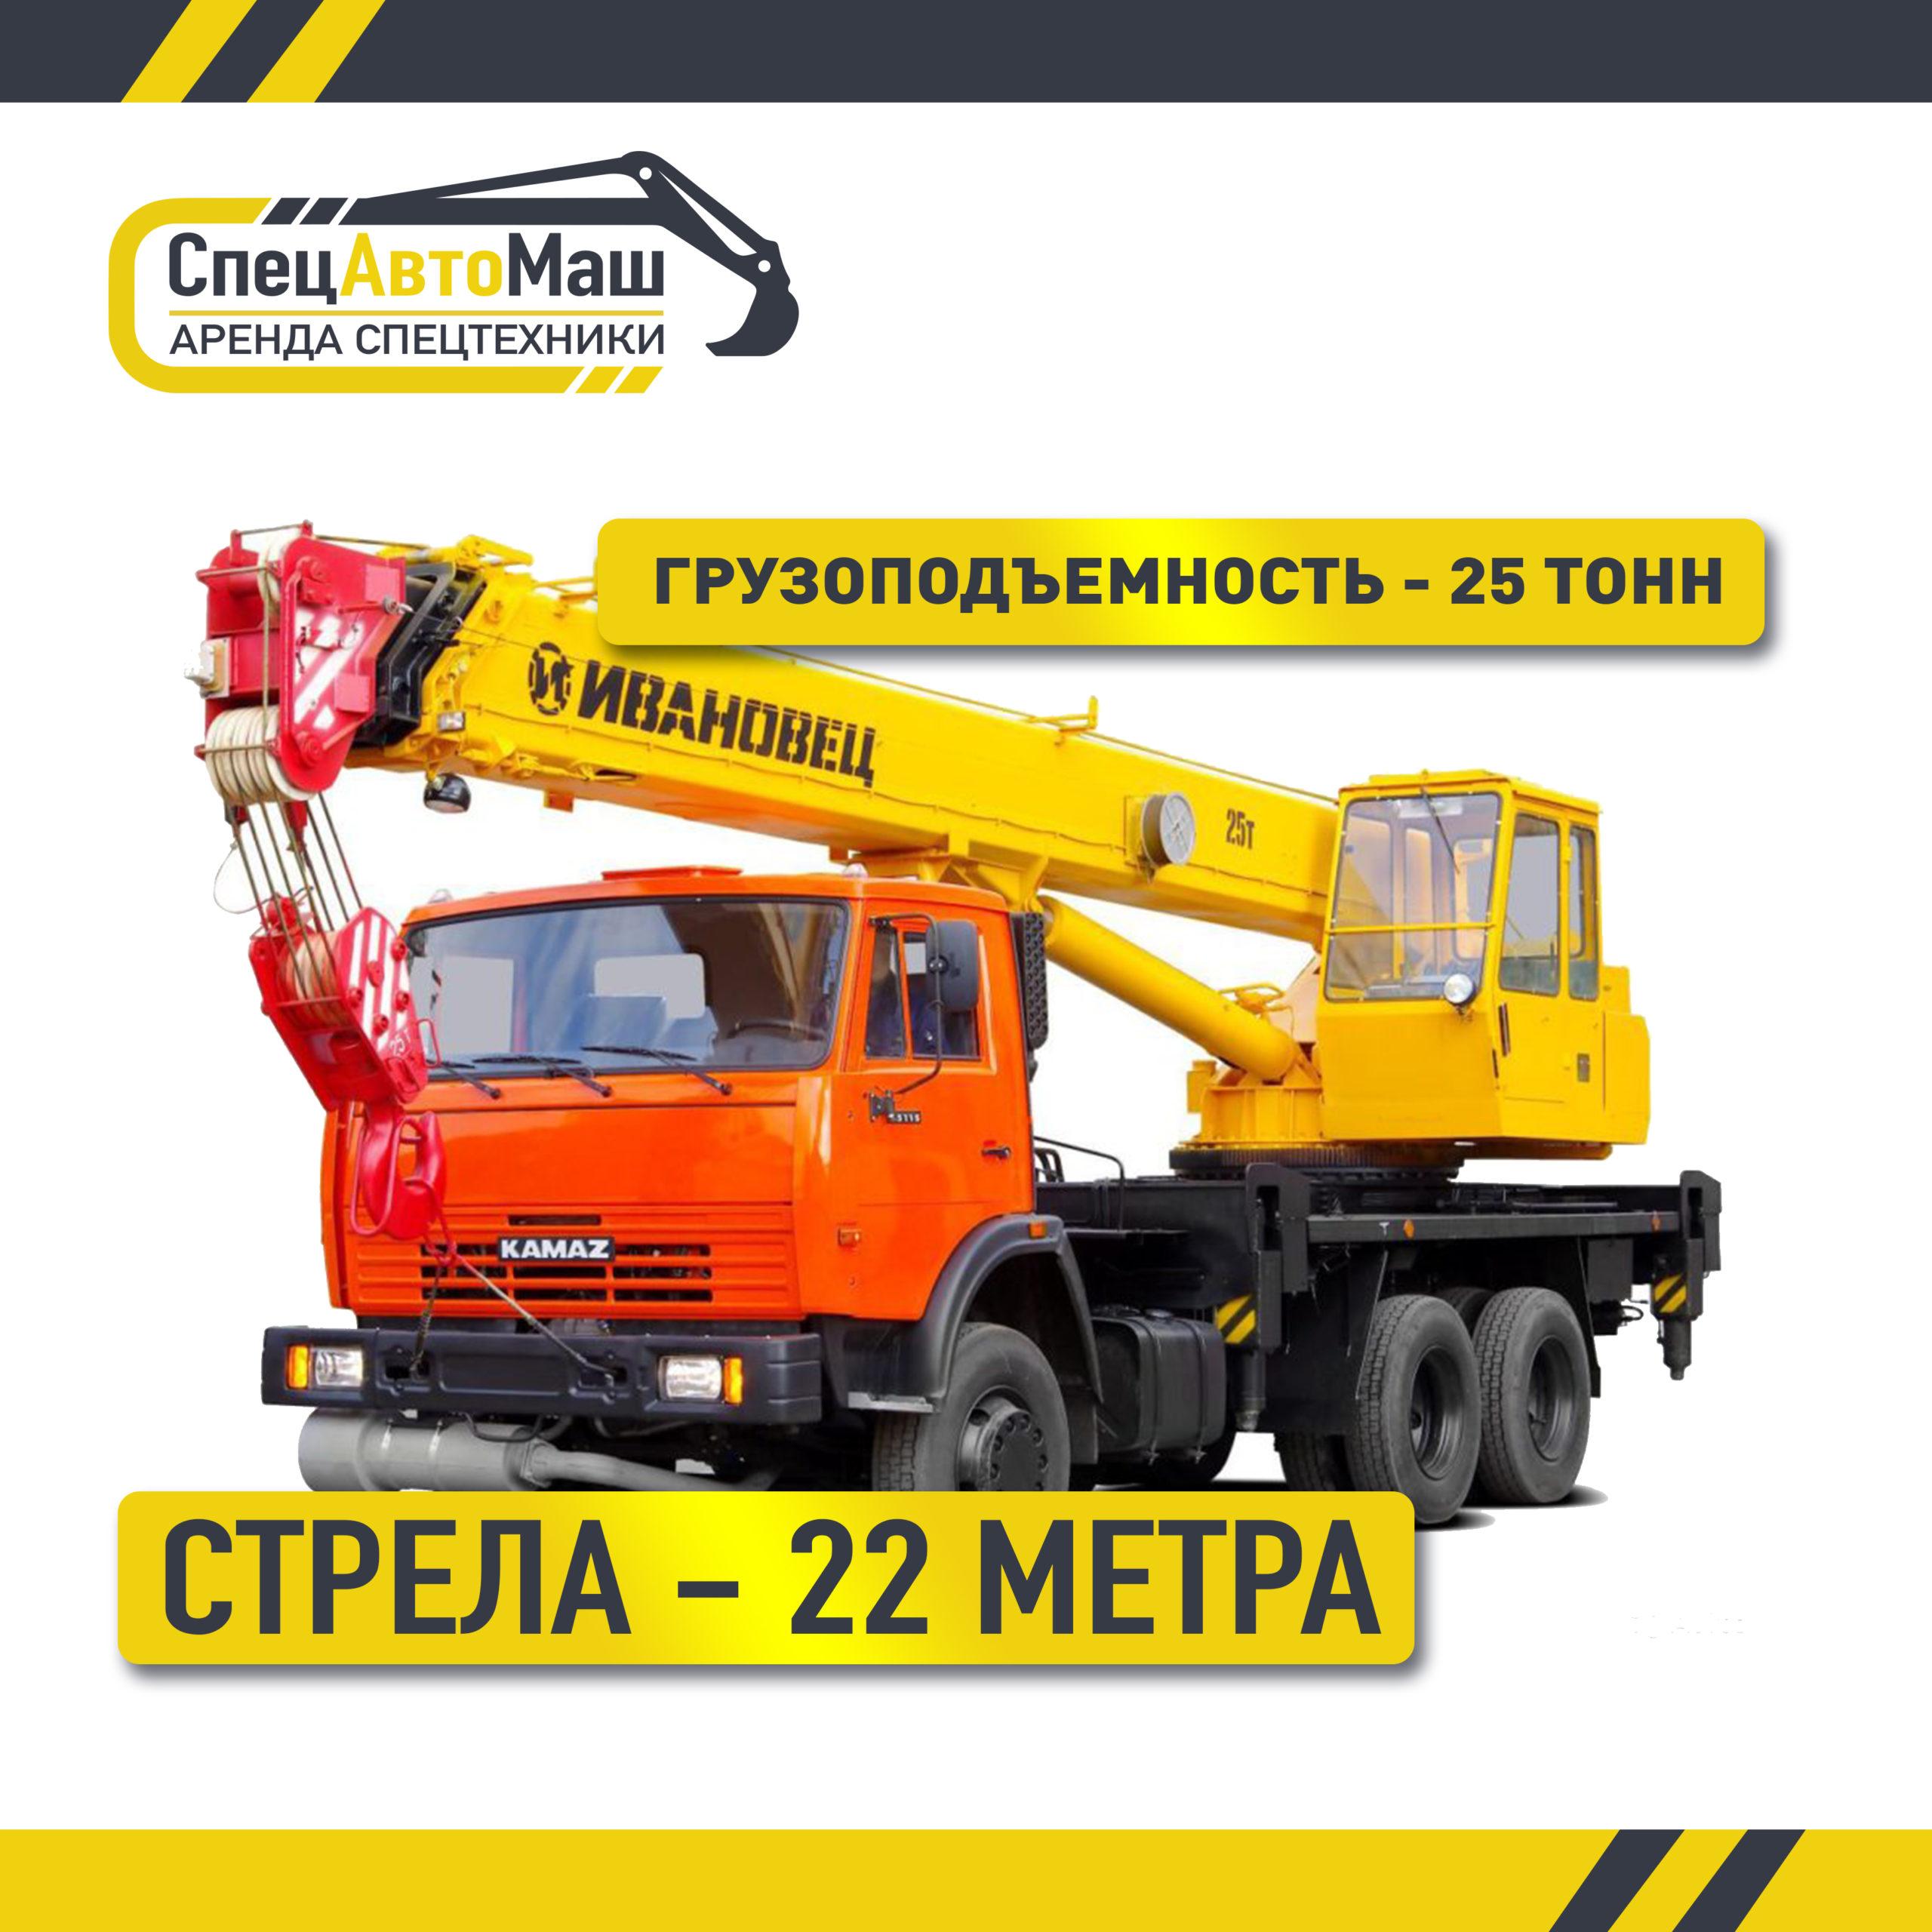 Автокран 22 метра Первоуральск аренда Екатеринбург